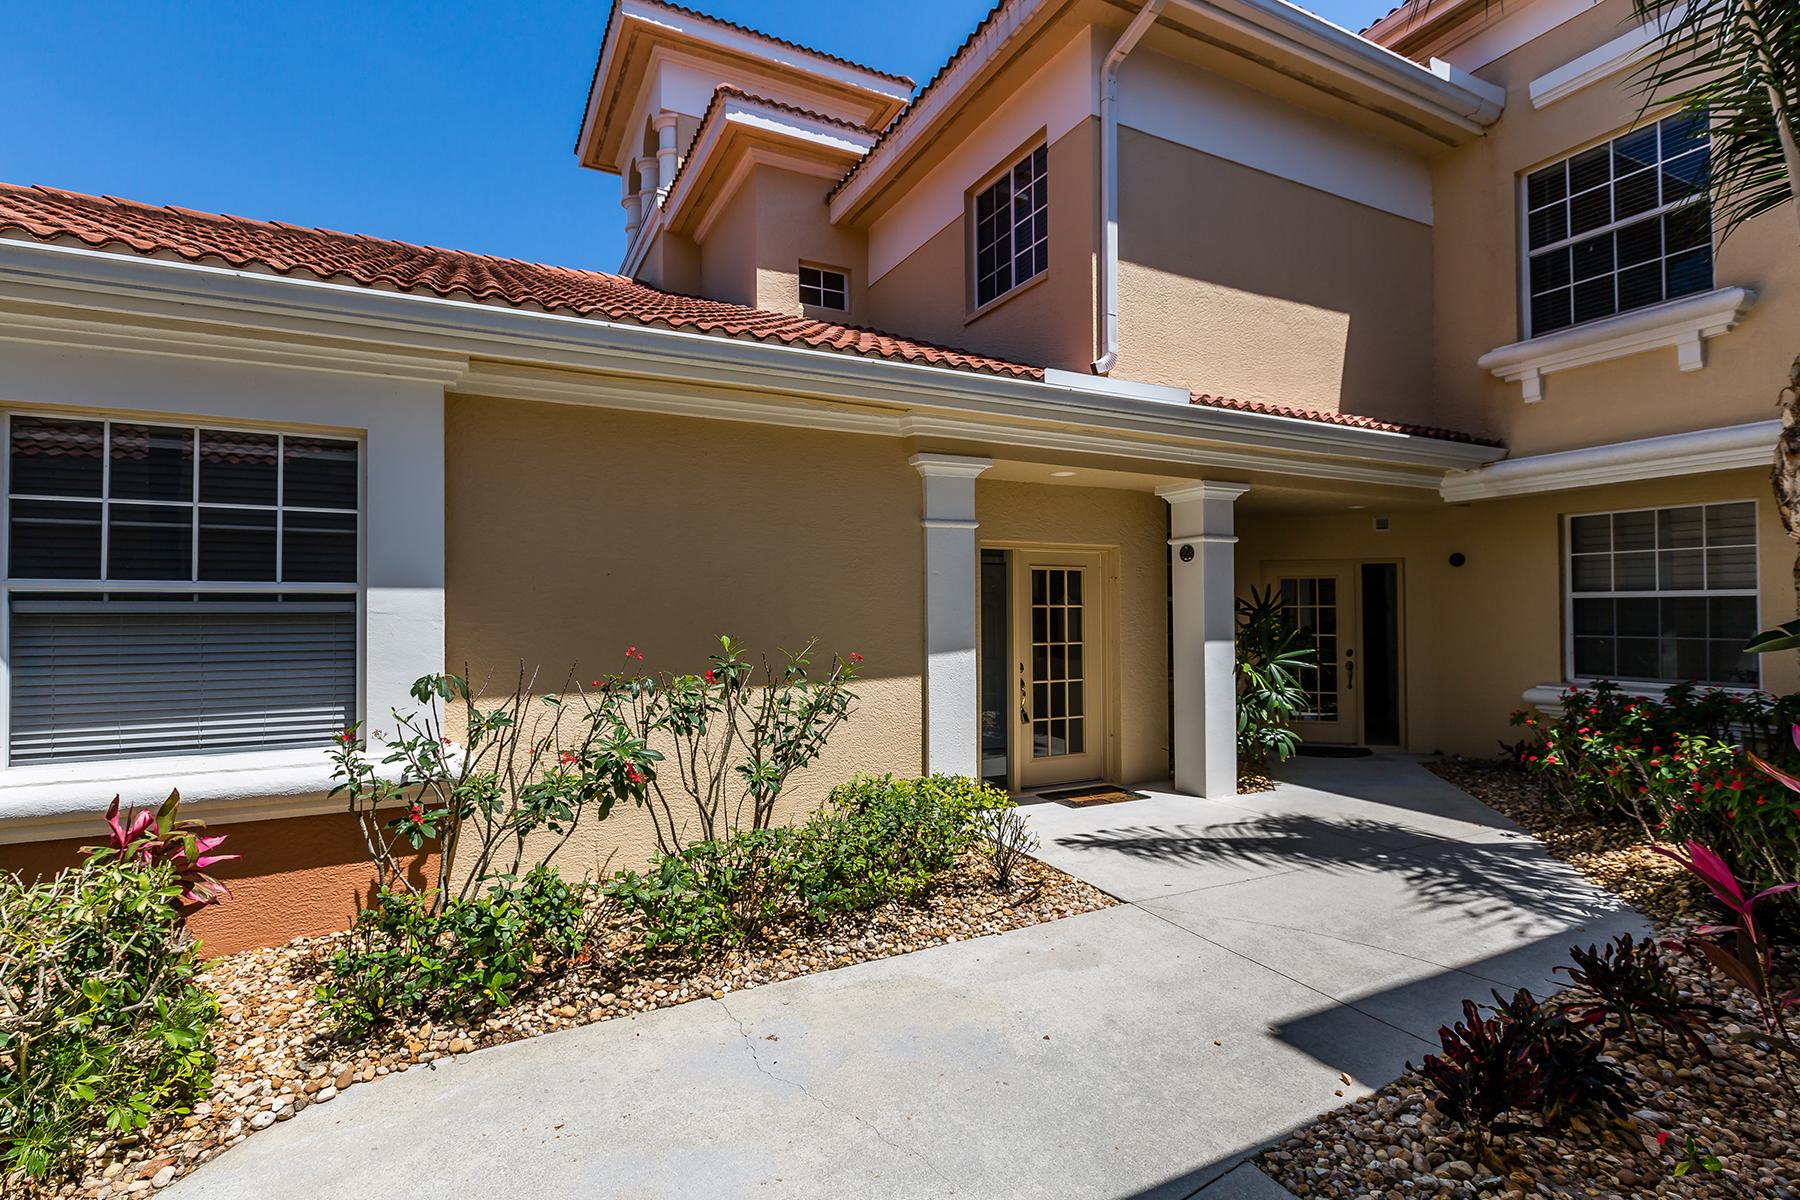 Condominium for Sale at FIDDLERS CREEK 3950 Deer Crossing Ct 203, Naples, Florida 34114 United States